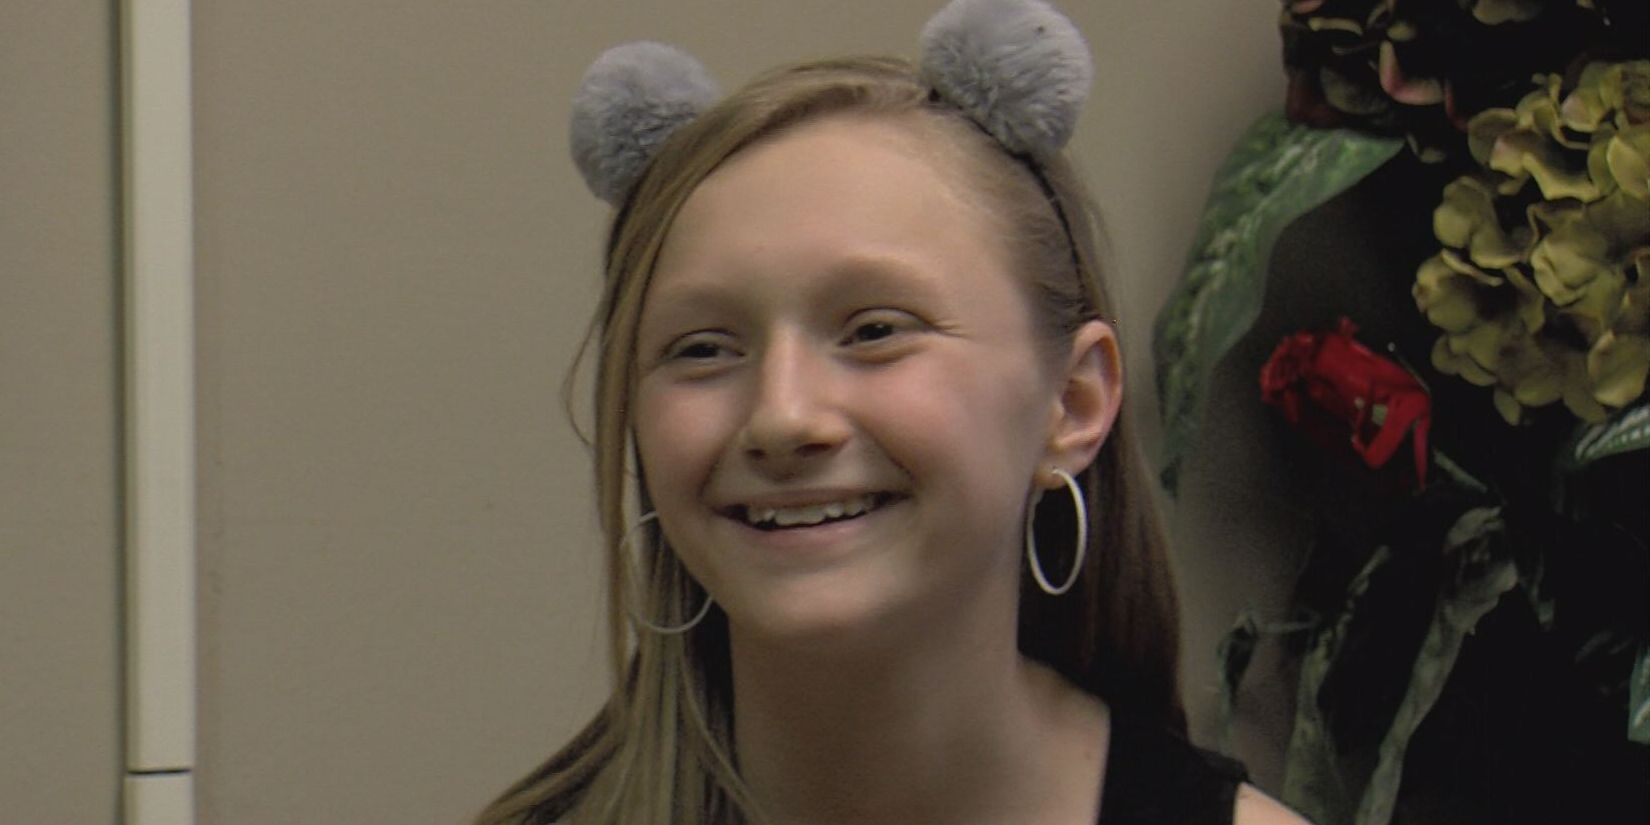 United Way Wednesday: Maverick Boys and Girls Club inspires Amarillo's youth